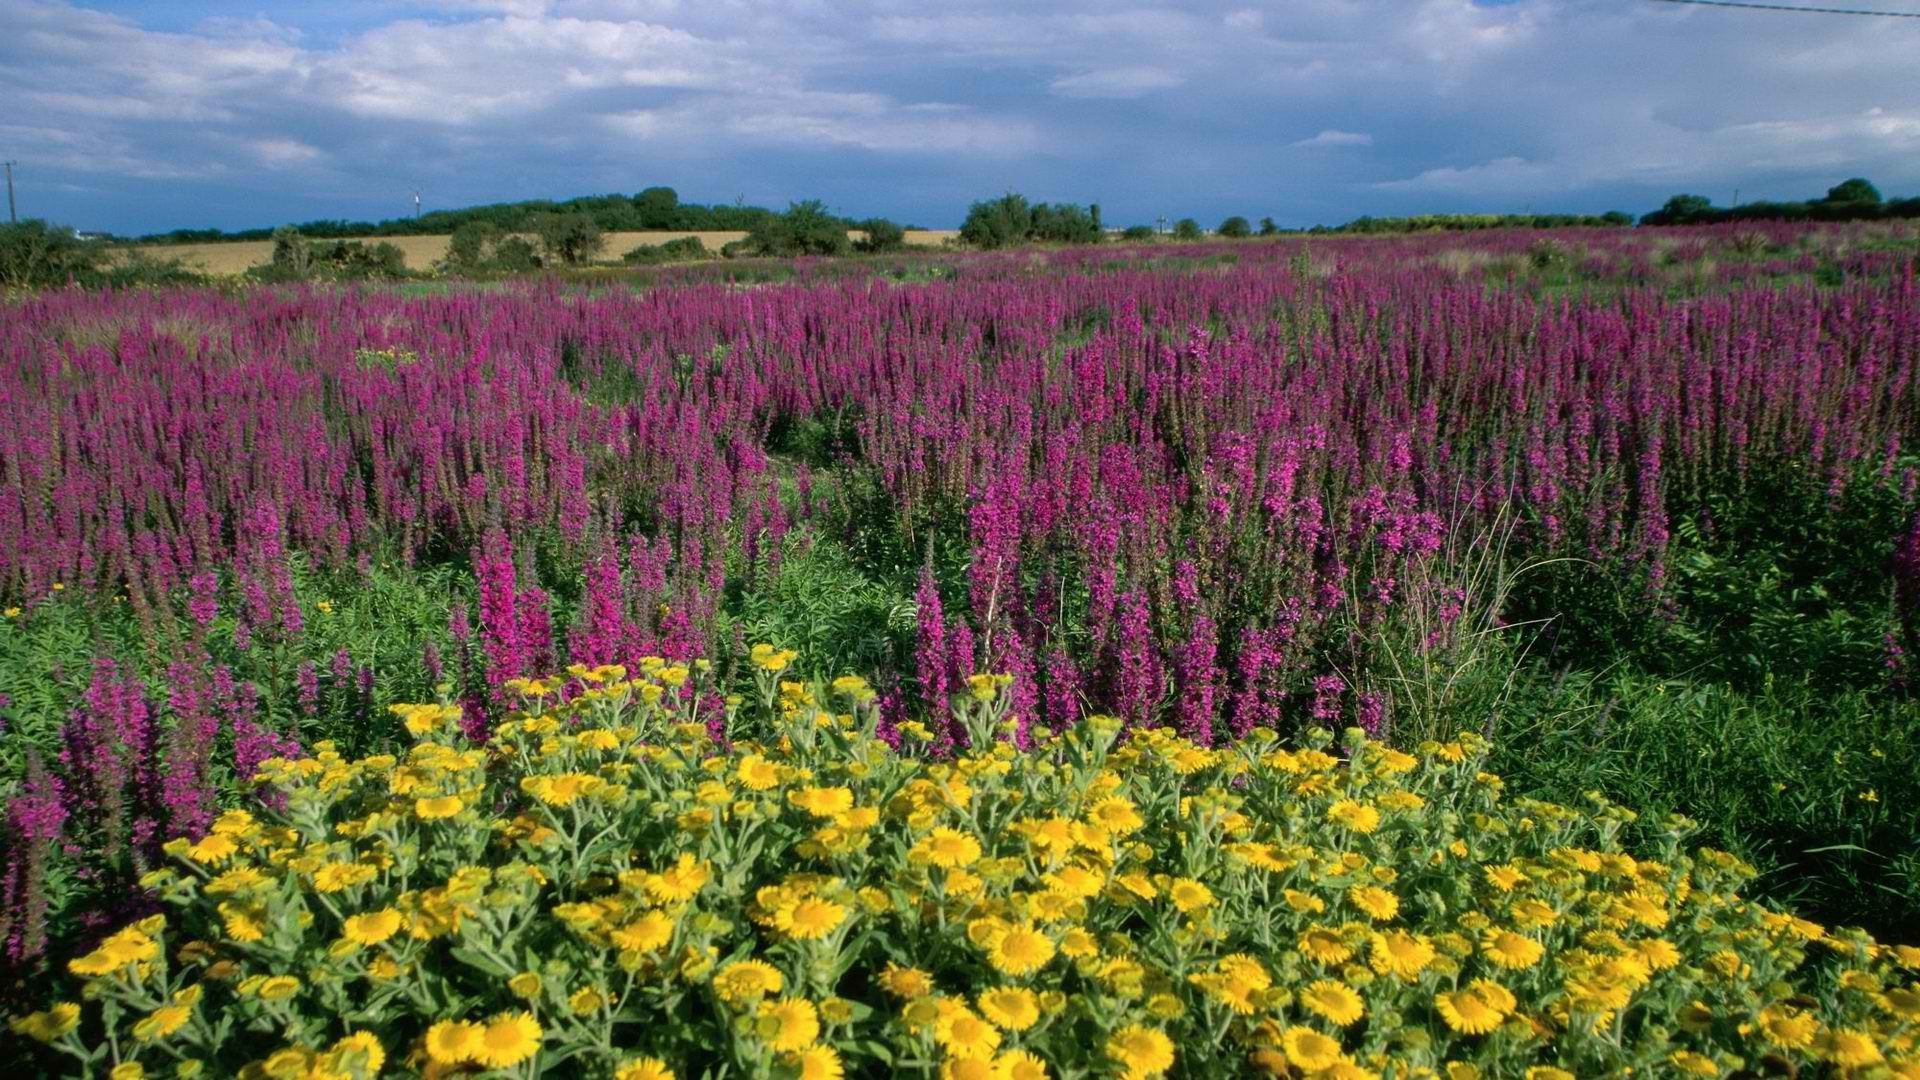 Lavender field wallpaper 2455 1920x1080